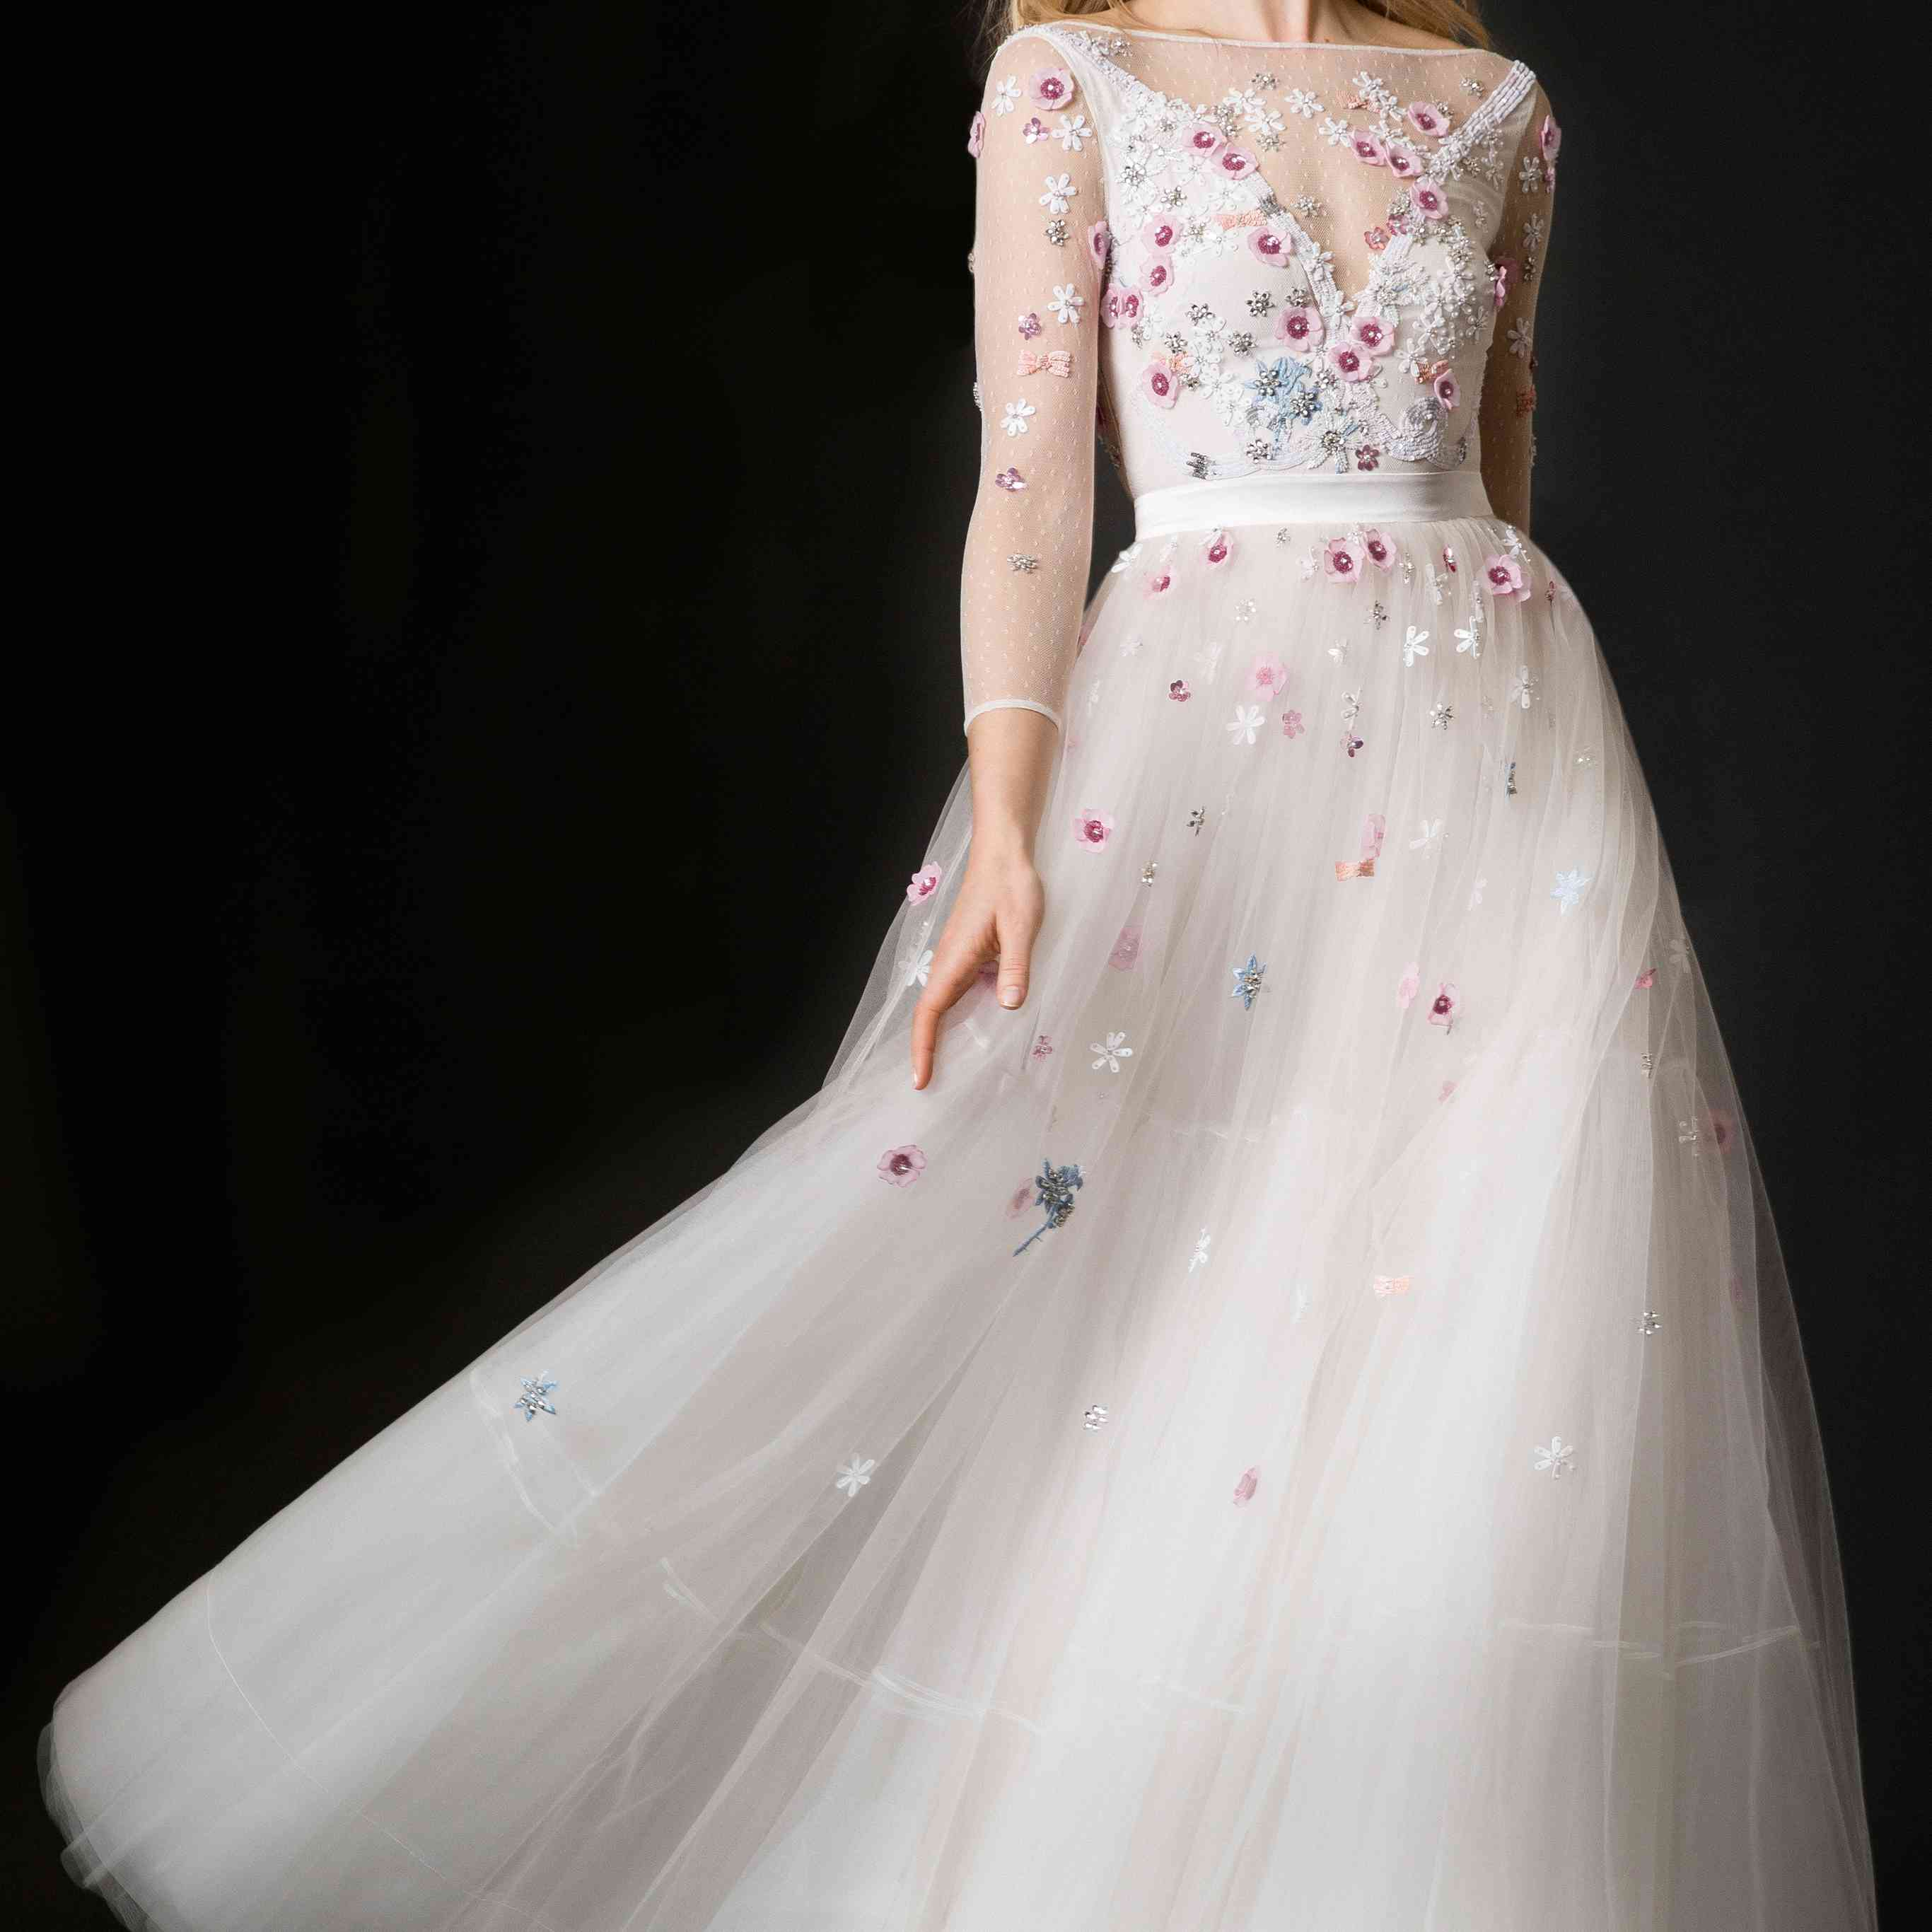 Temperley Bridal Spring 2019